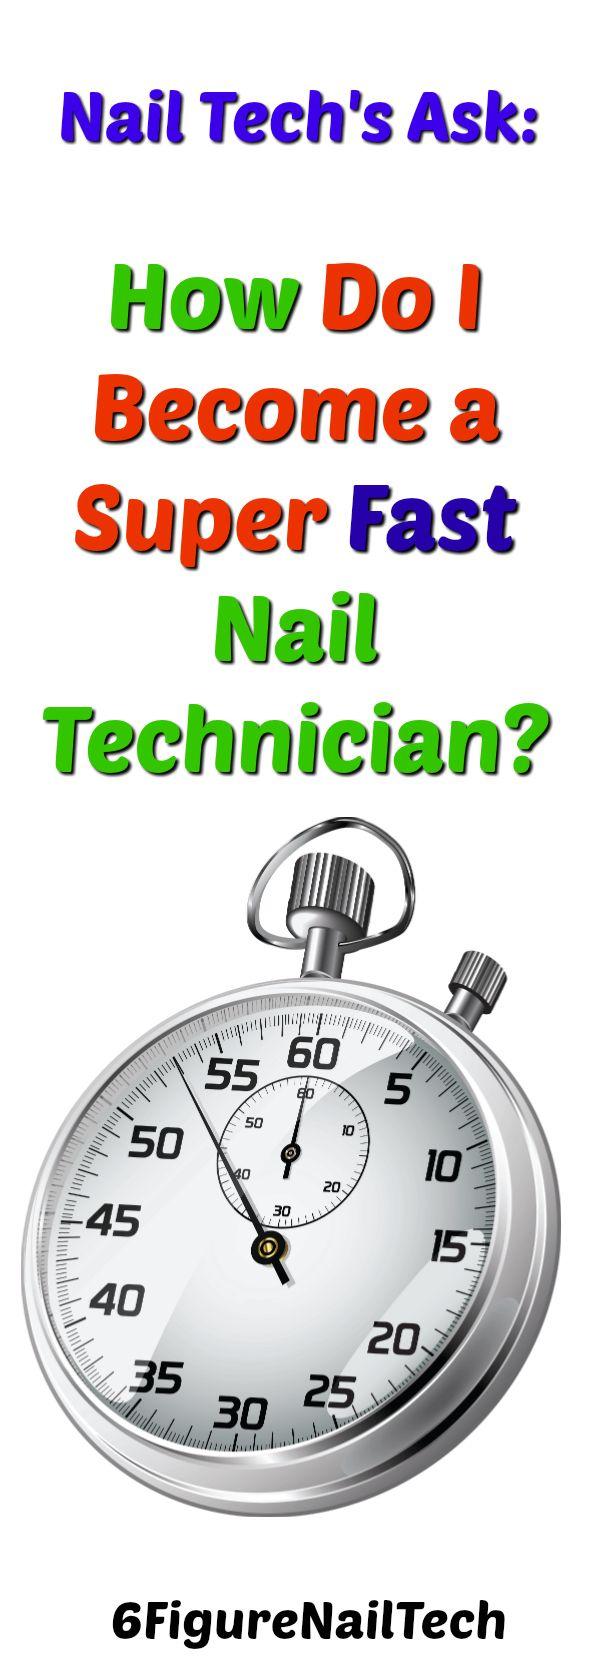 How Do I A Super Fast Nail Technician Fast nail